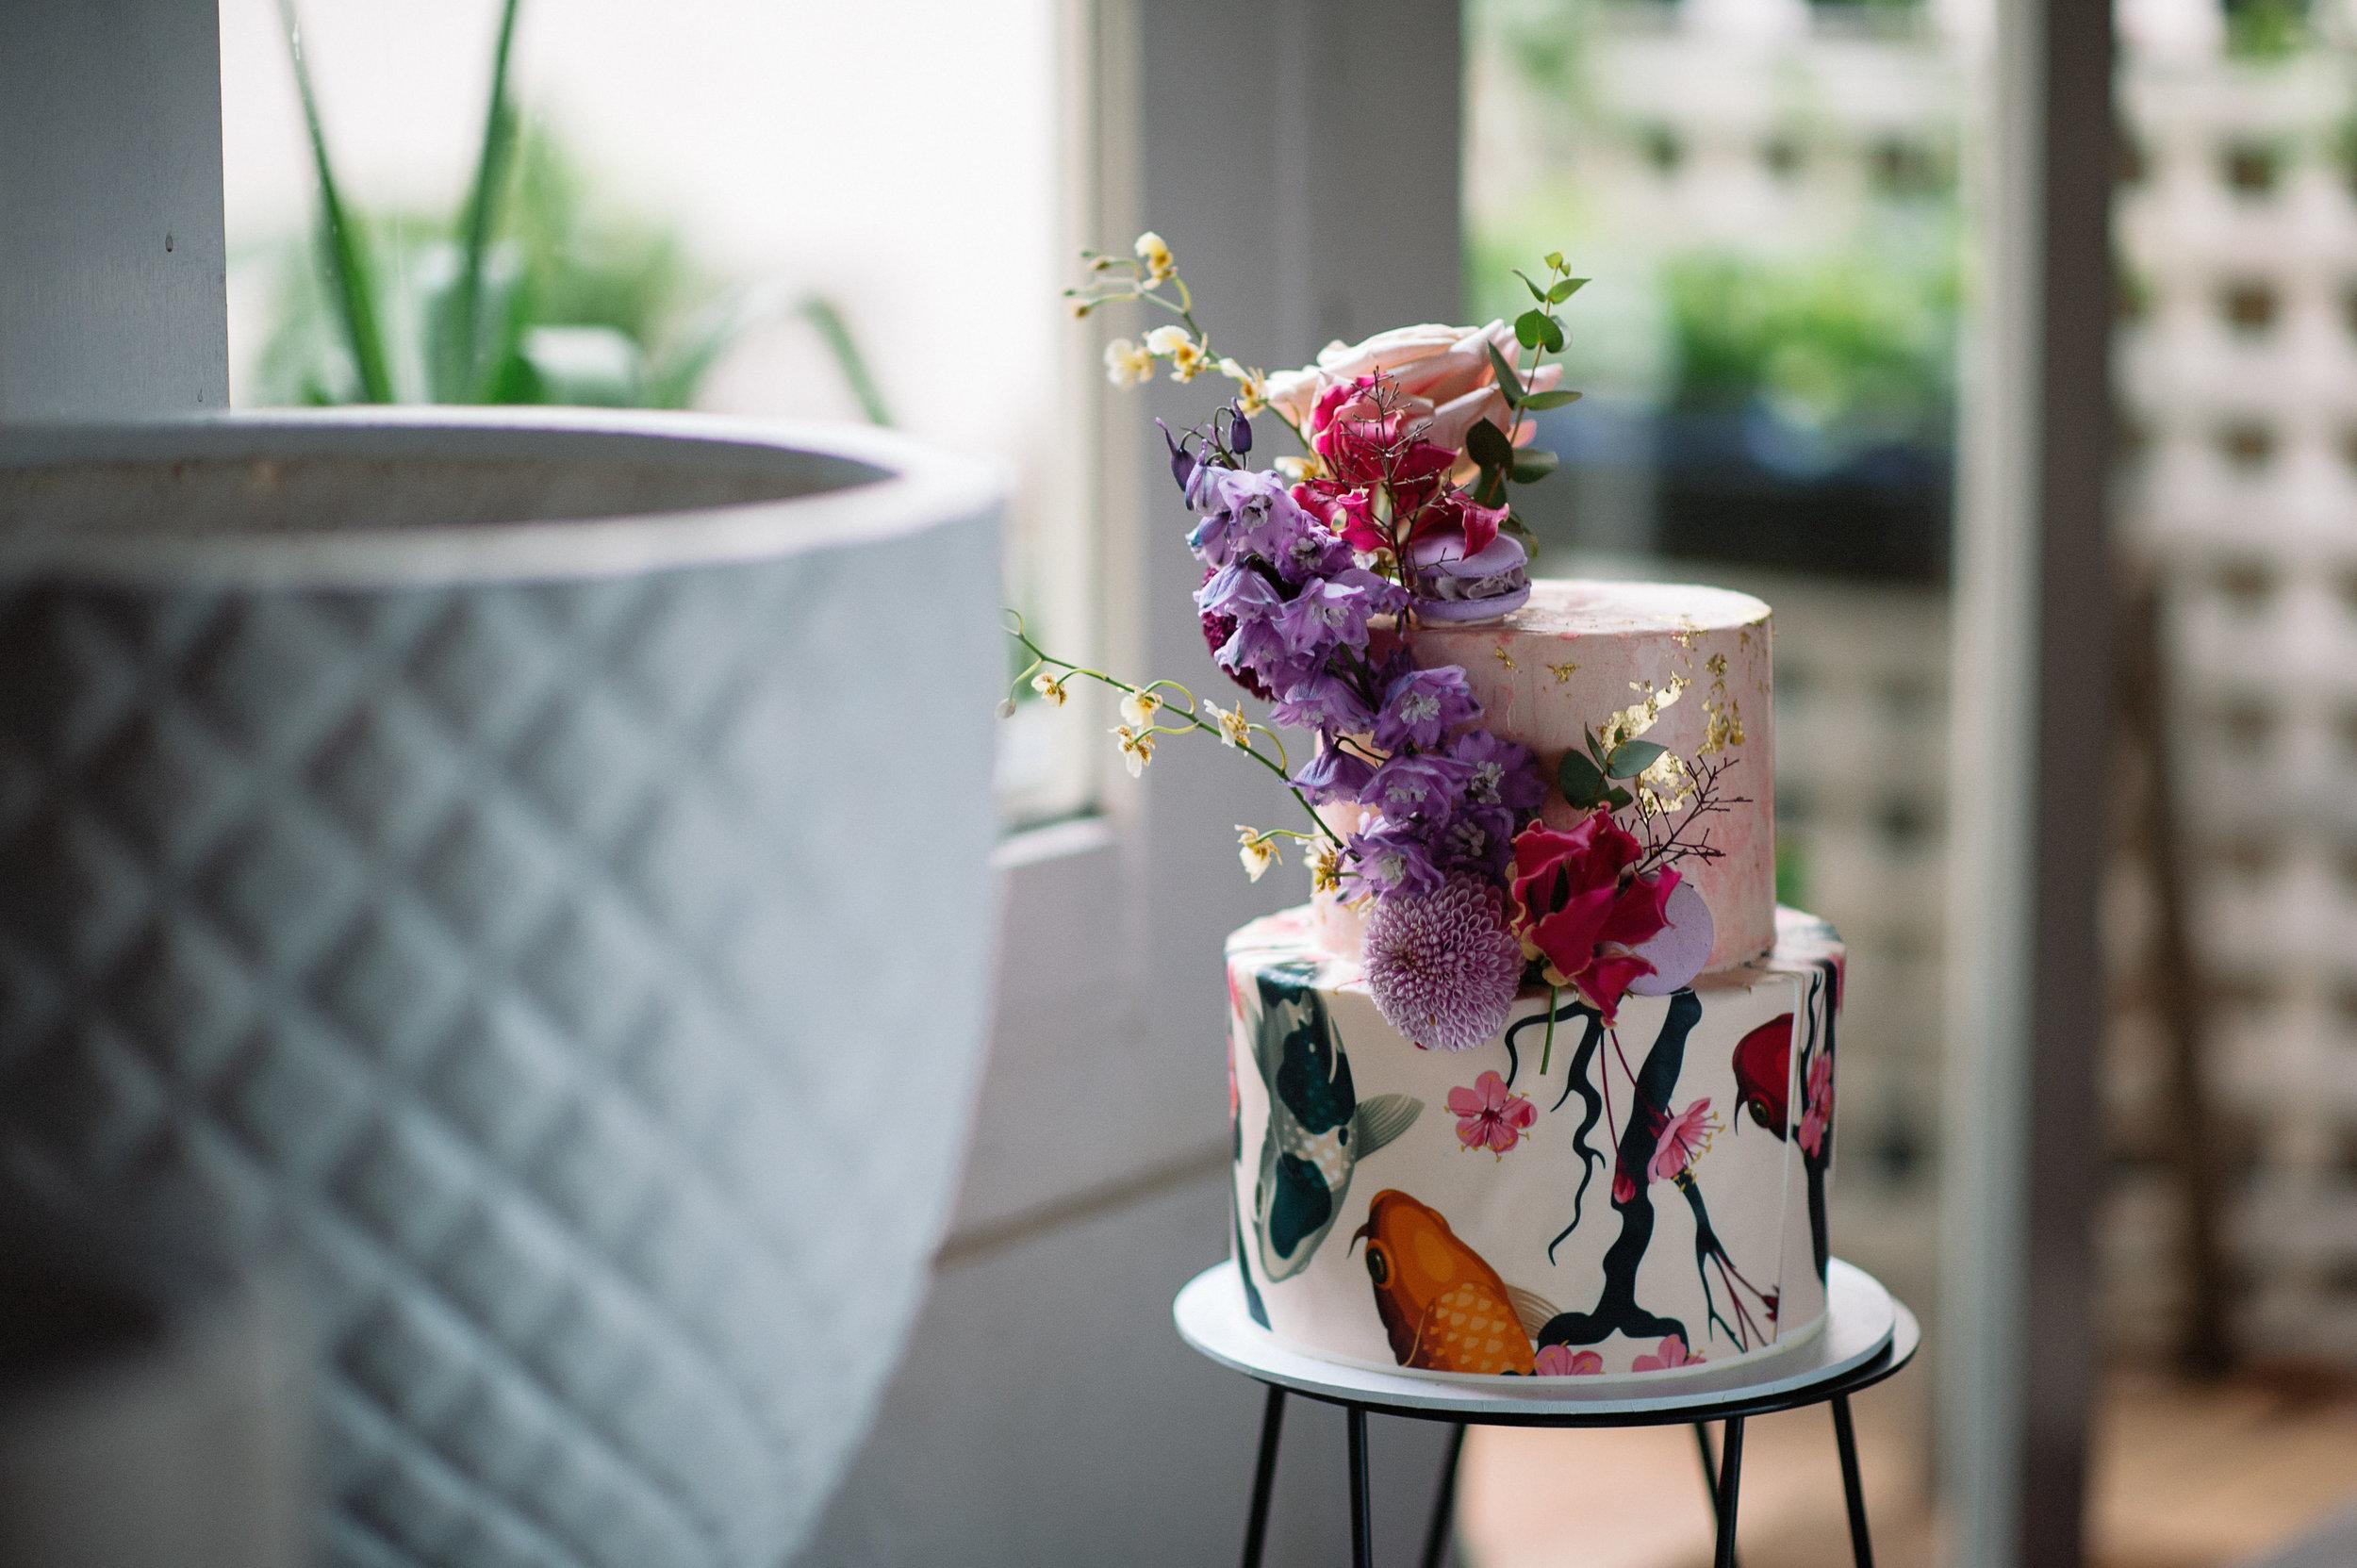 cherrycakes-14-046.jpg